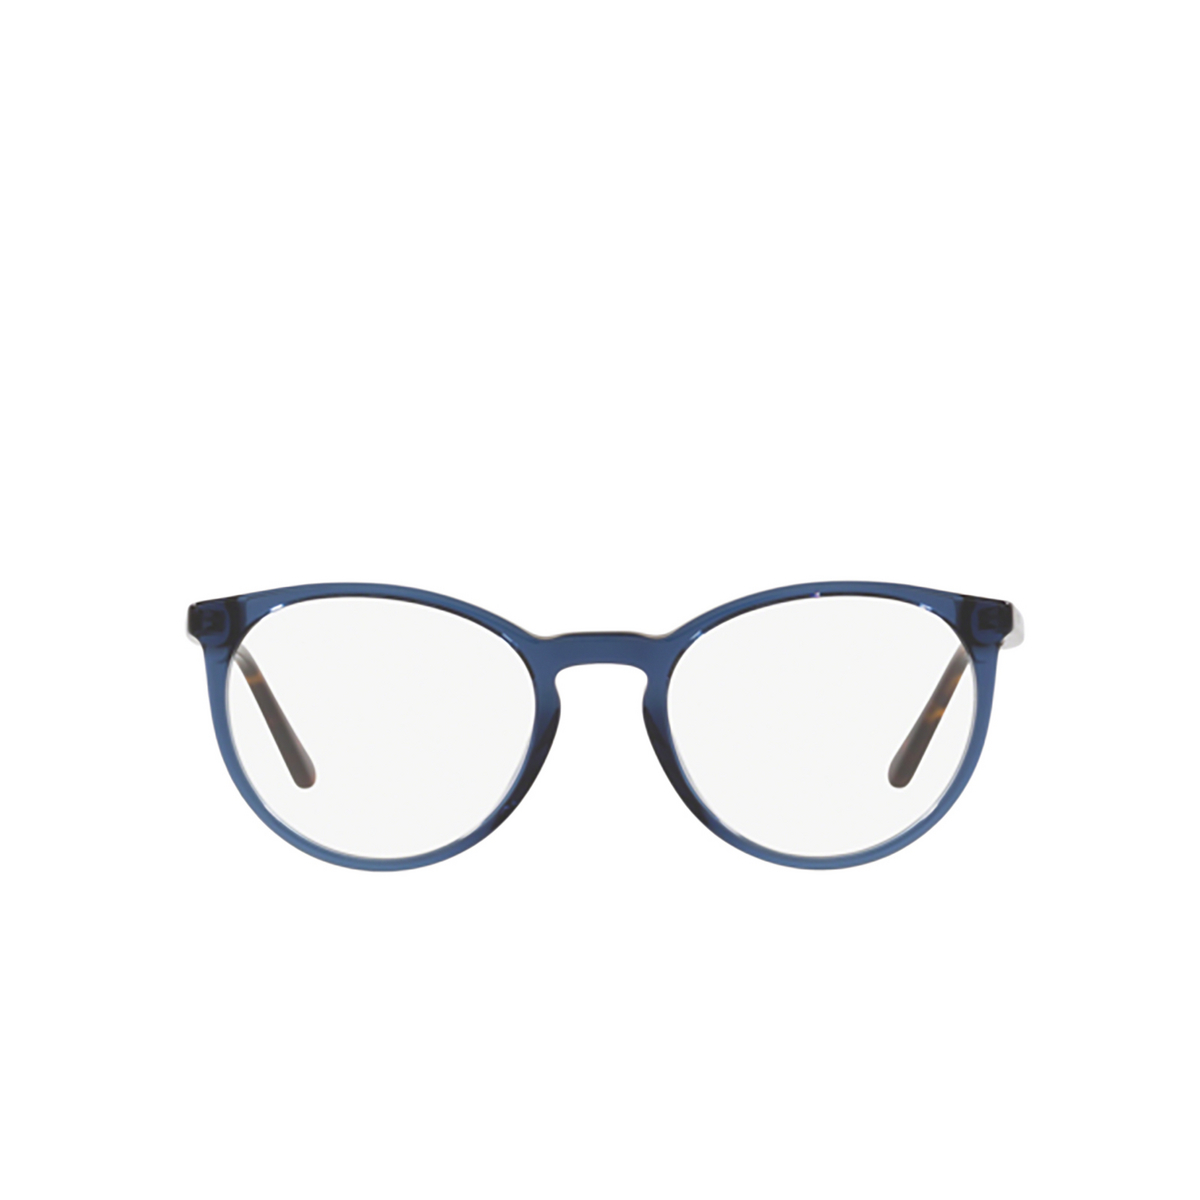 Polo Ralph Lauren® Round Eyeglasses: PH2193 color Shiny Transparent Blue 5276.